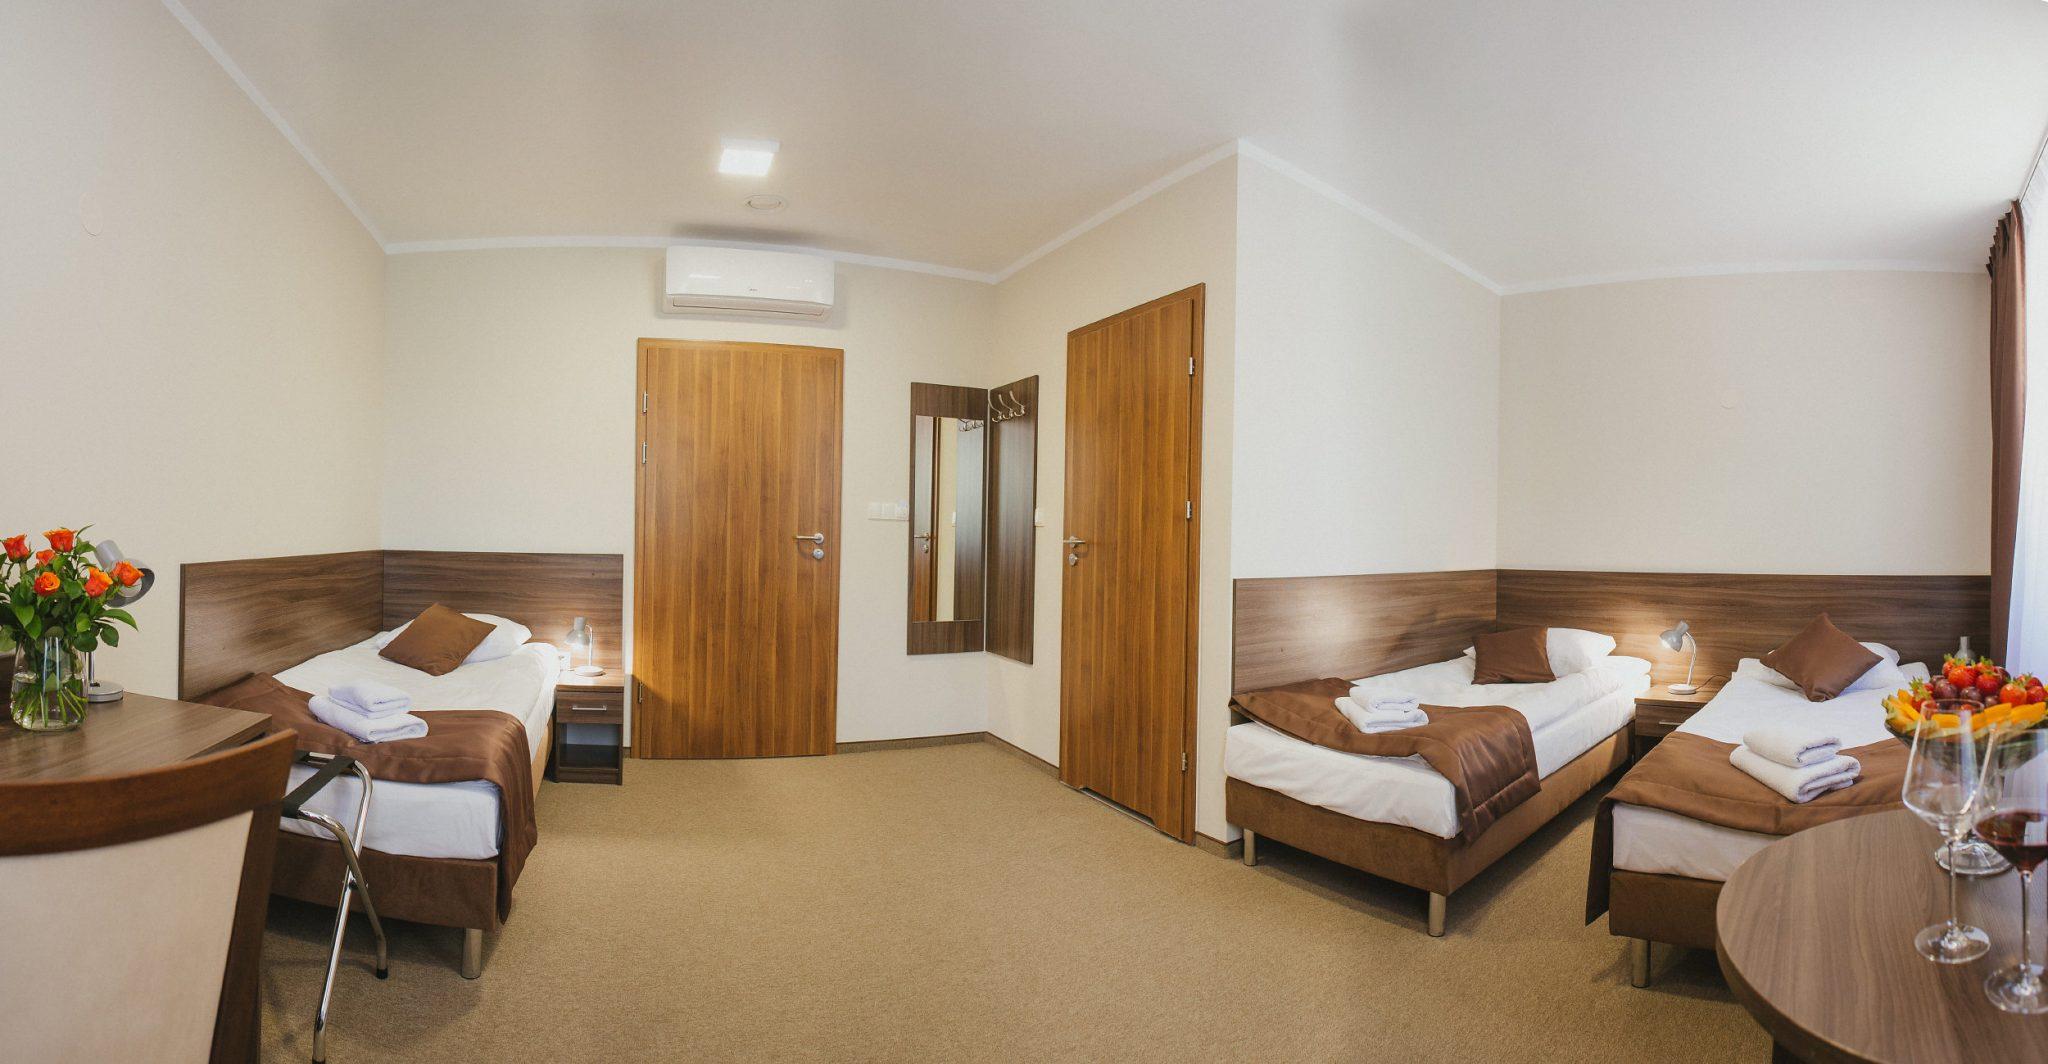 Swimming camps Oświęcim - hotel room - Road to Sport